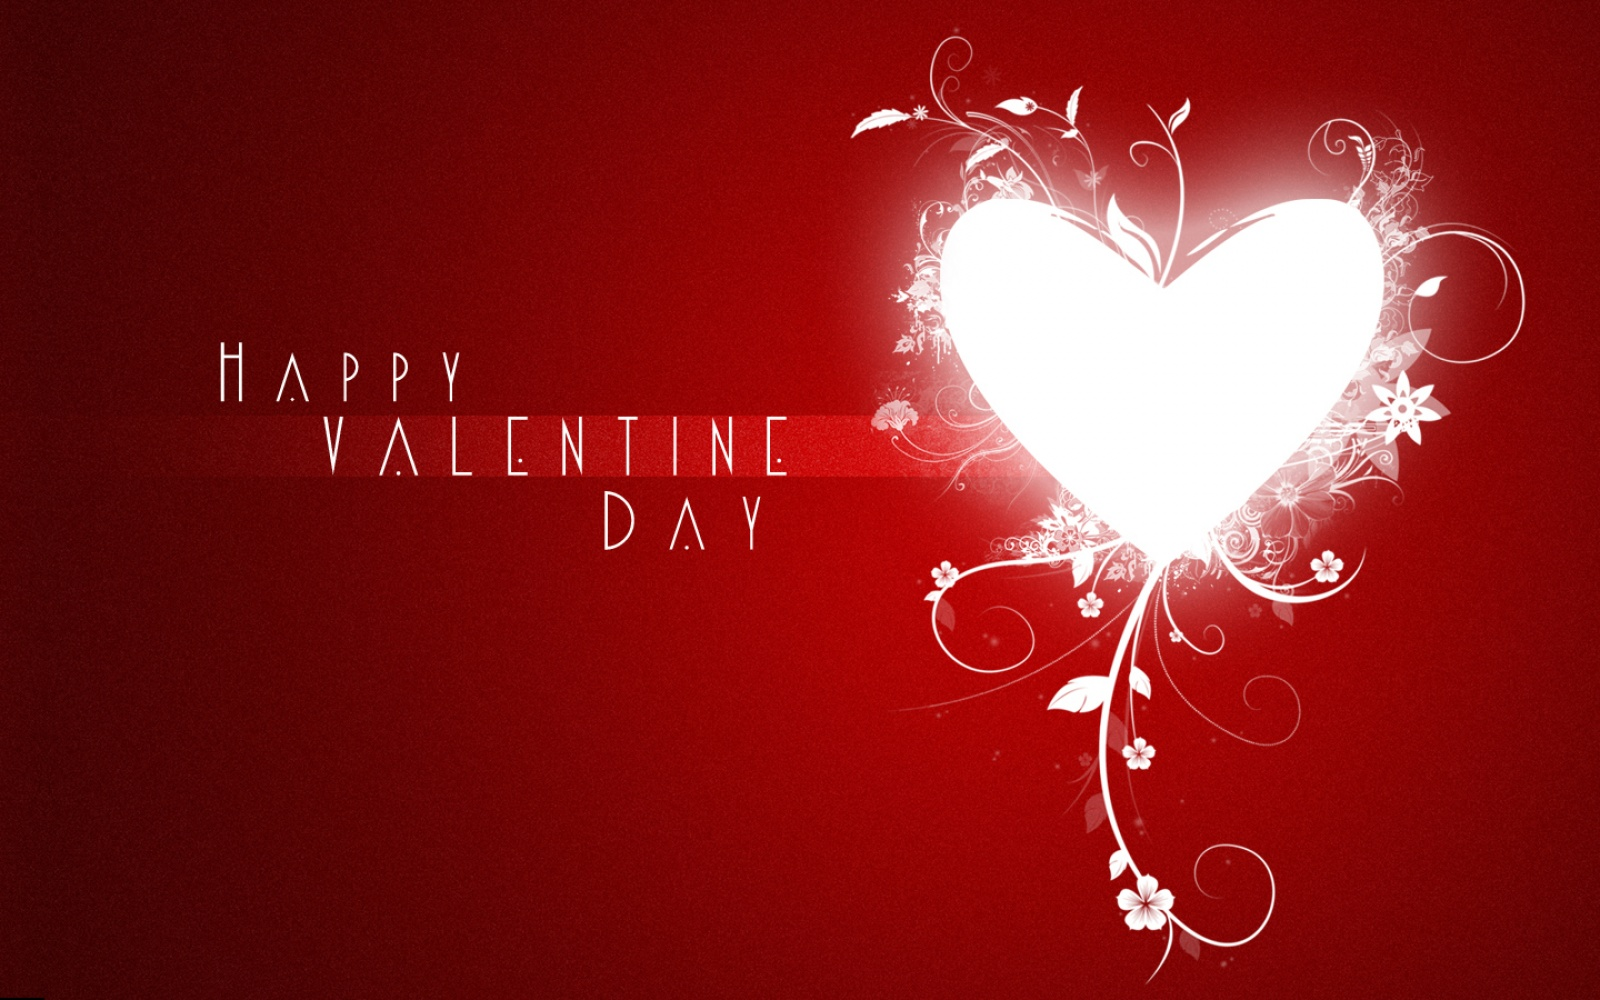 valentines day wallpaper 2012 I   Celebes 1600x1000